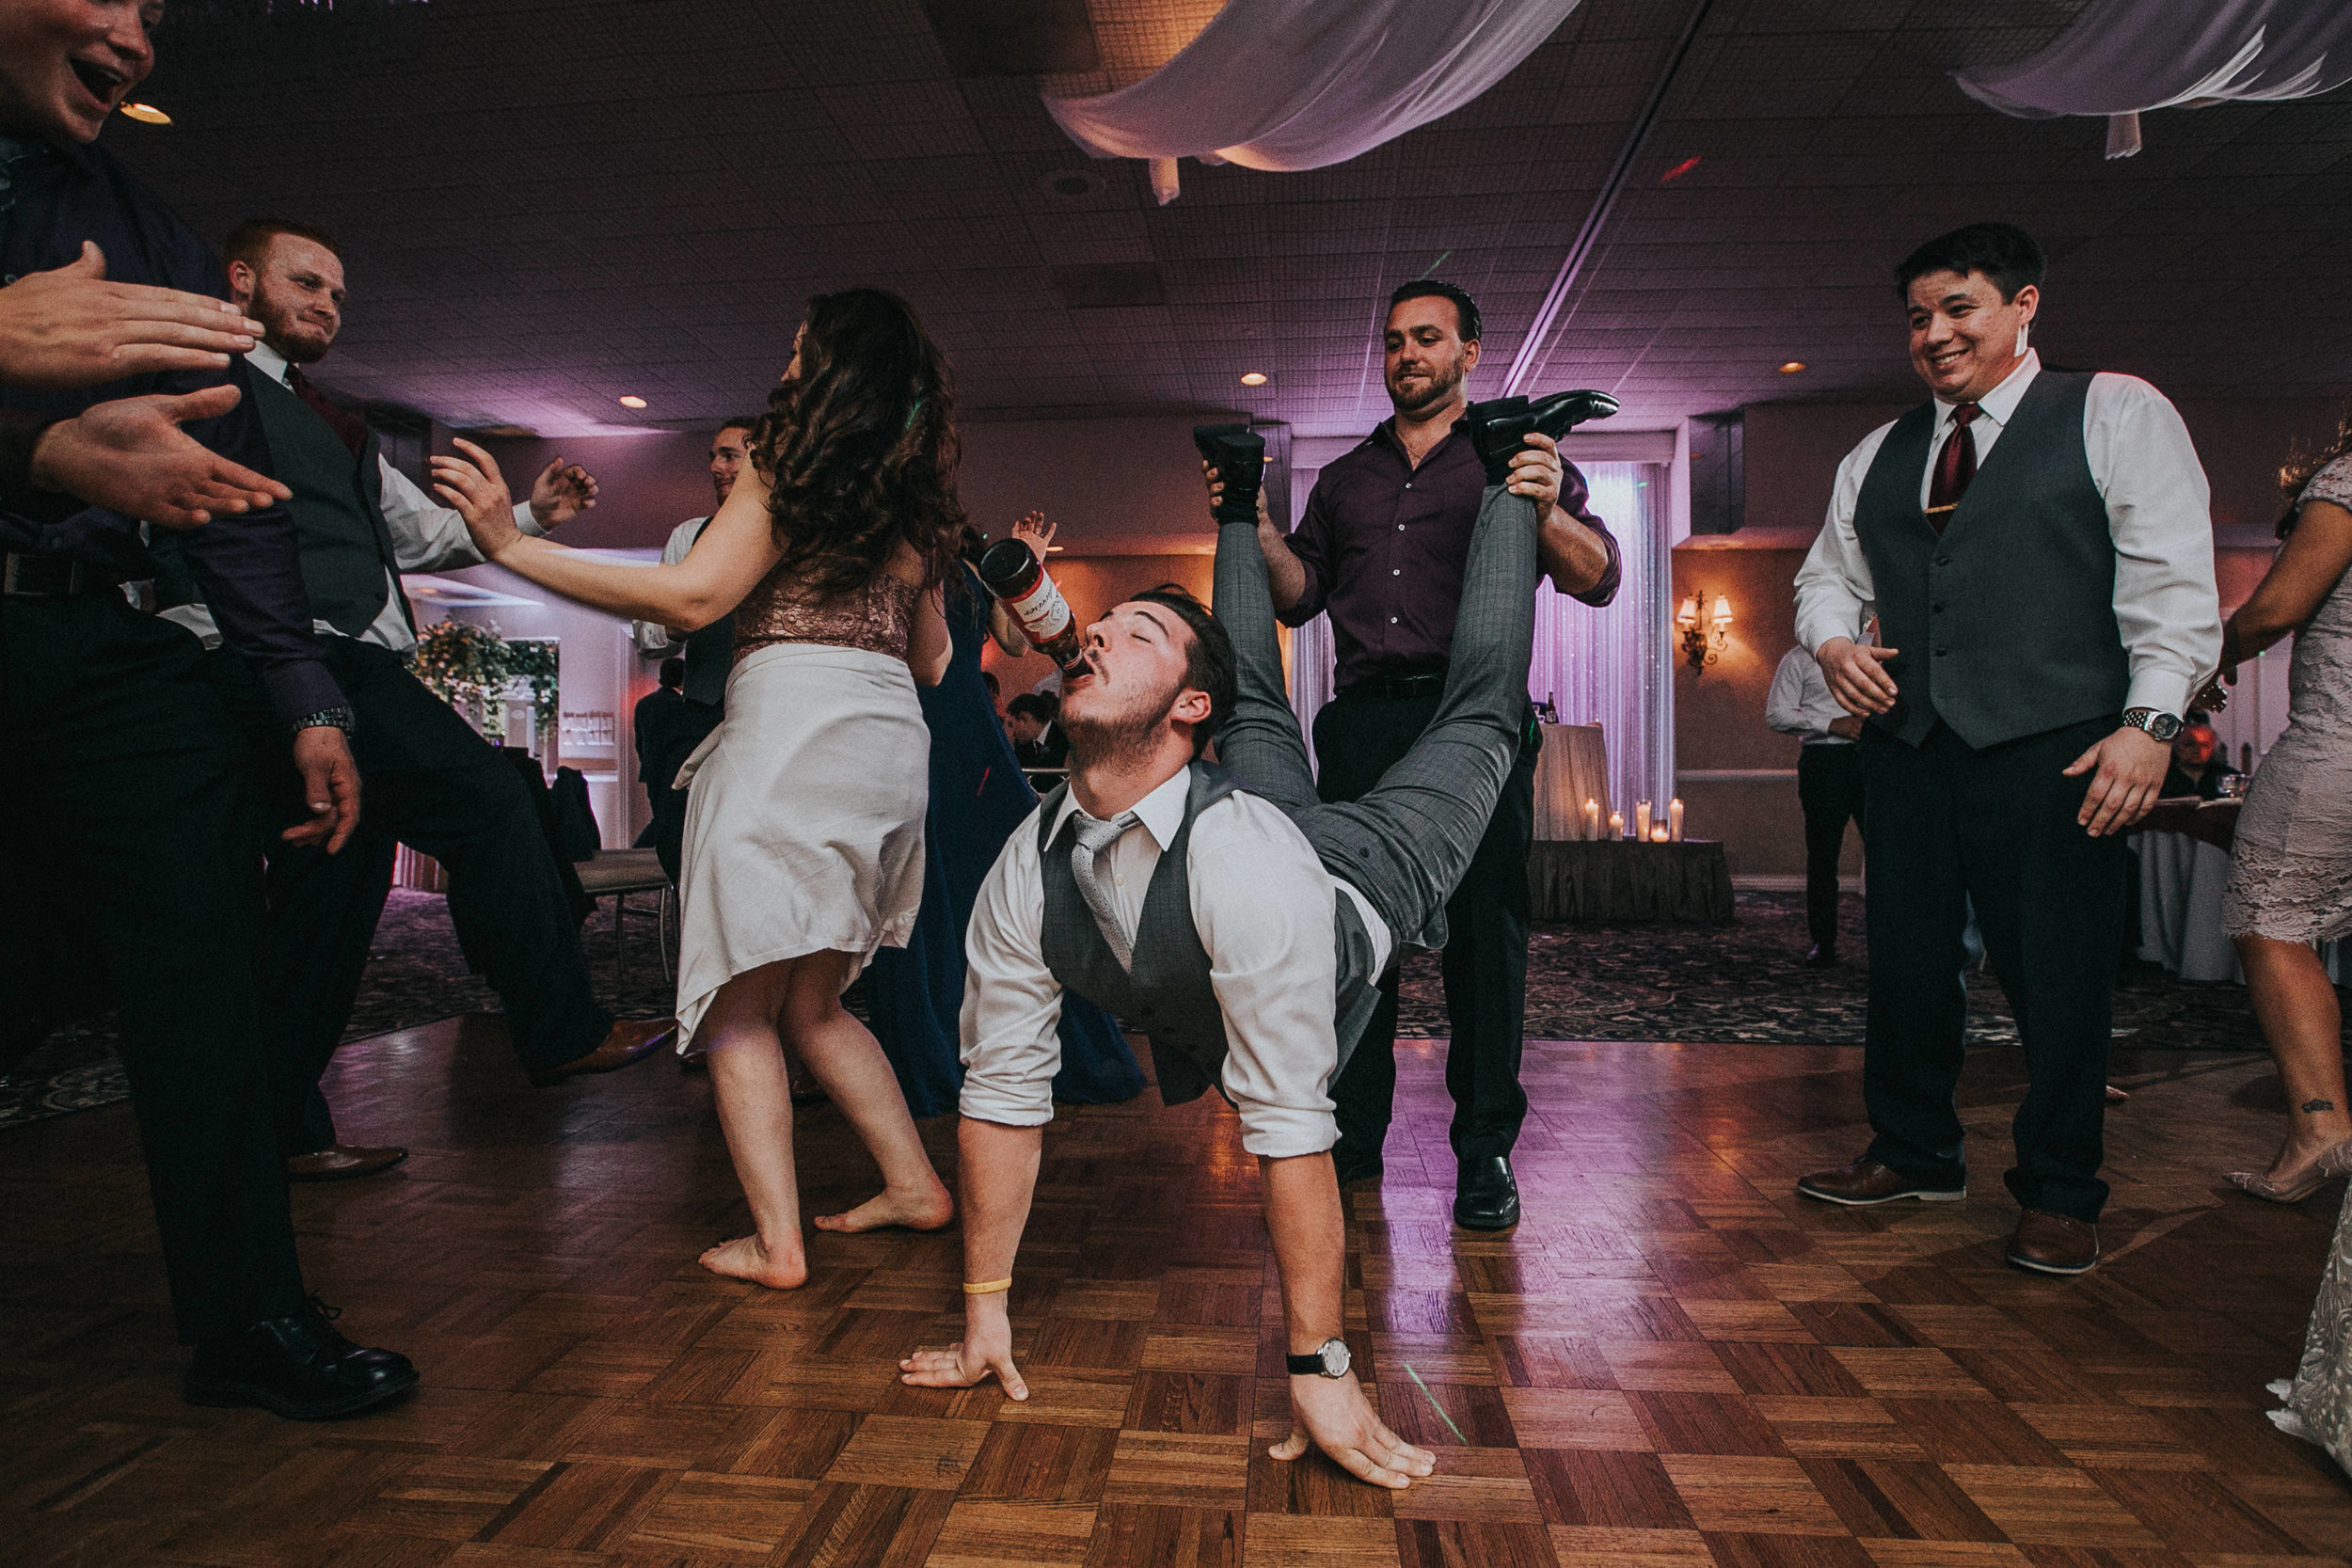 New-Jersey-Wedding-Photographer-ReceptionCenter-Valeria&Mike-Reception (190 of 265).jpg